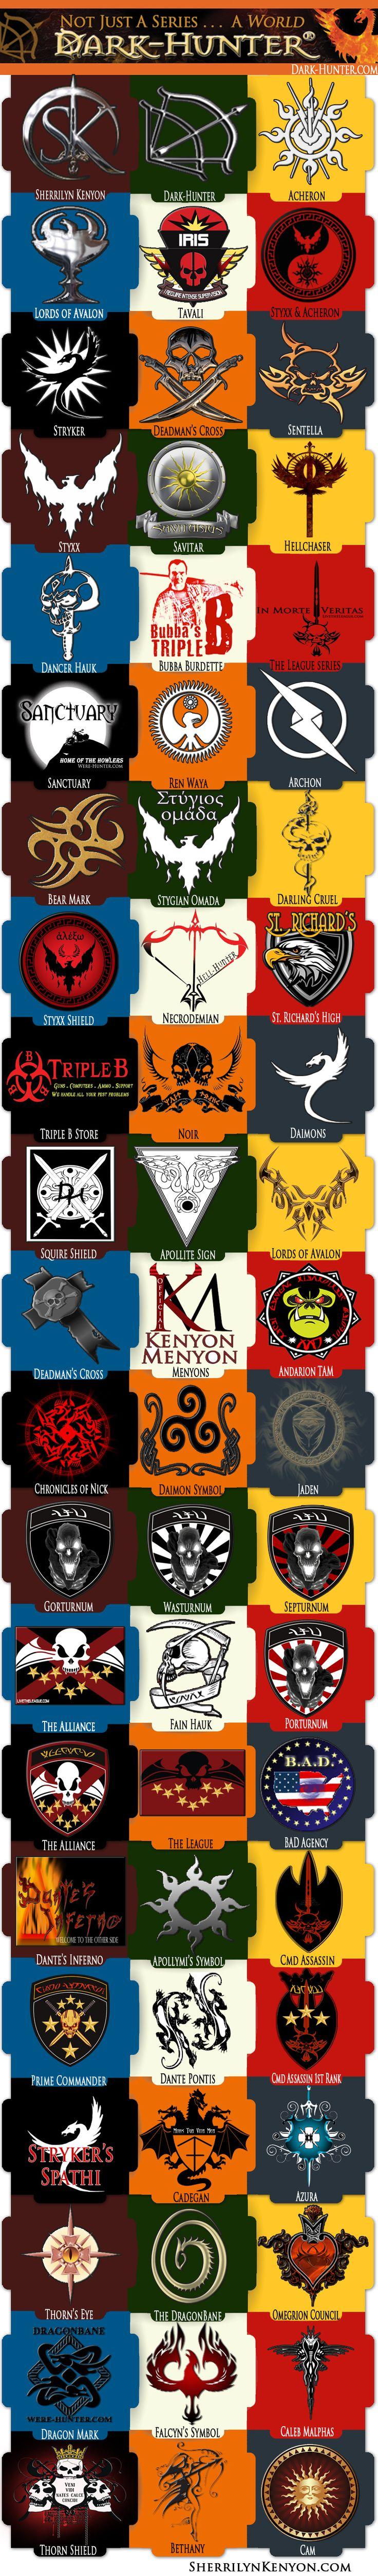 Logos From The Sk Series Dark Hunterbook